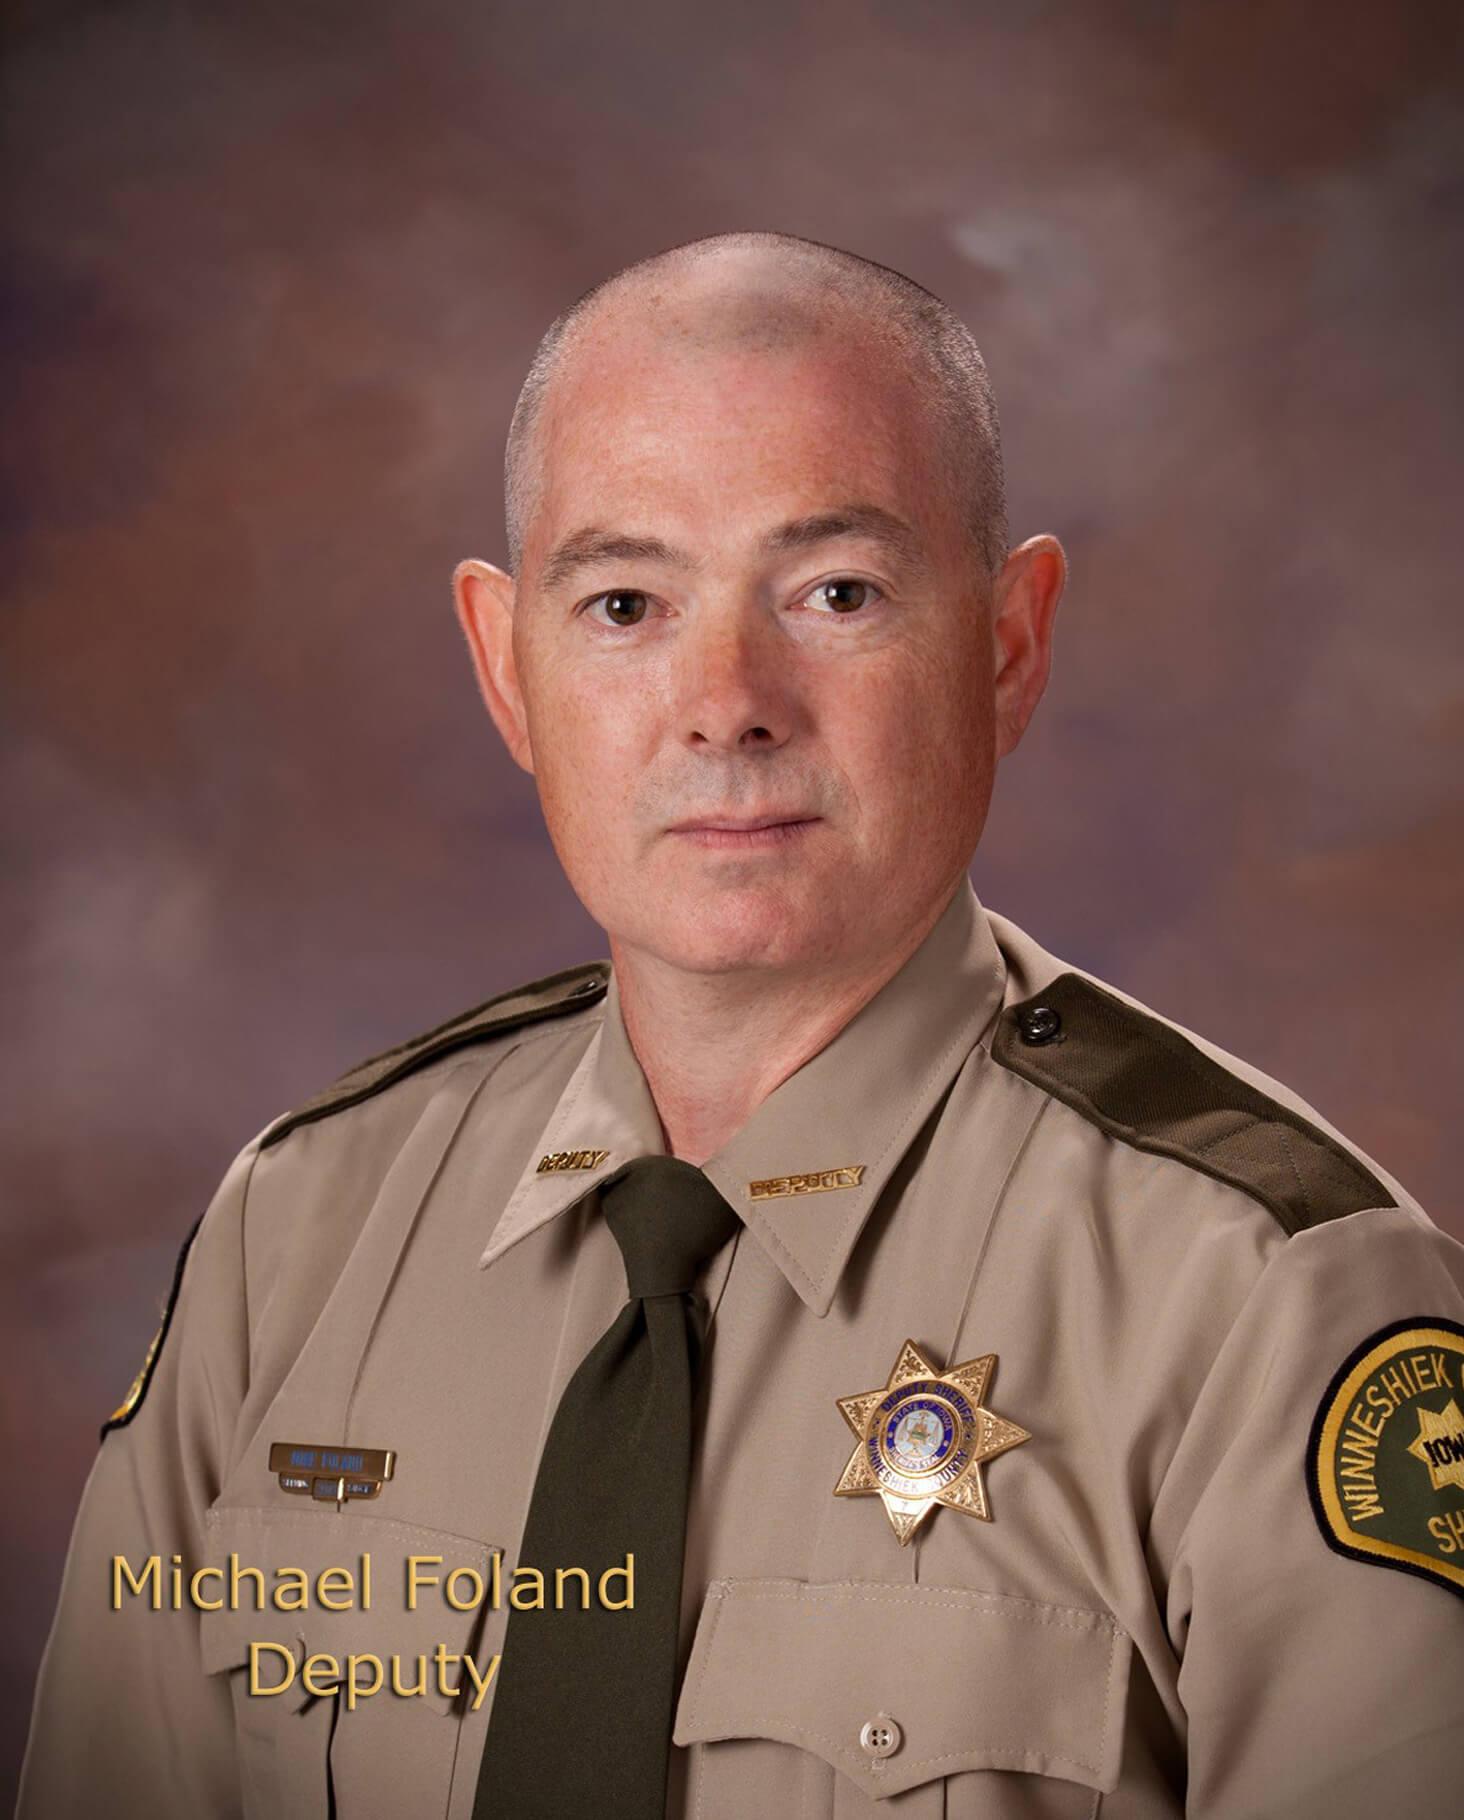 Mike Foland, Deputy Sheriff/Detective